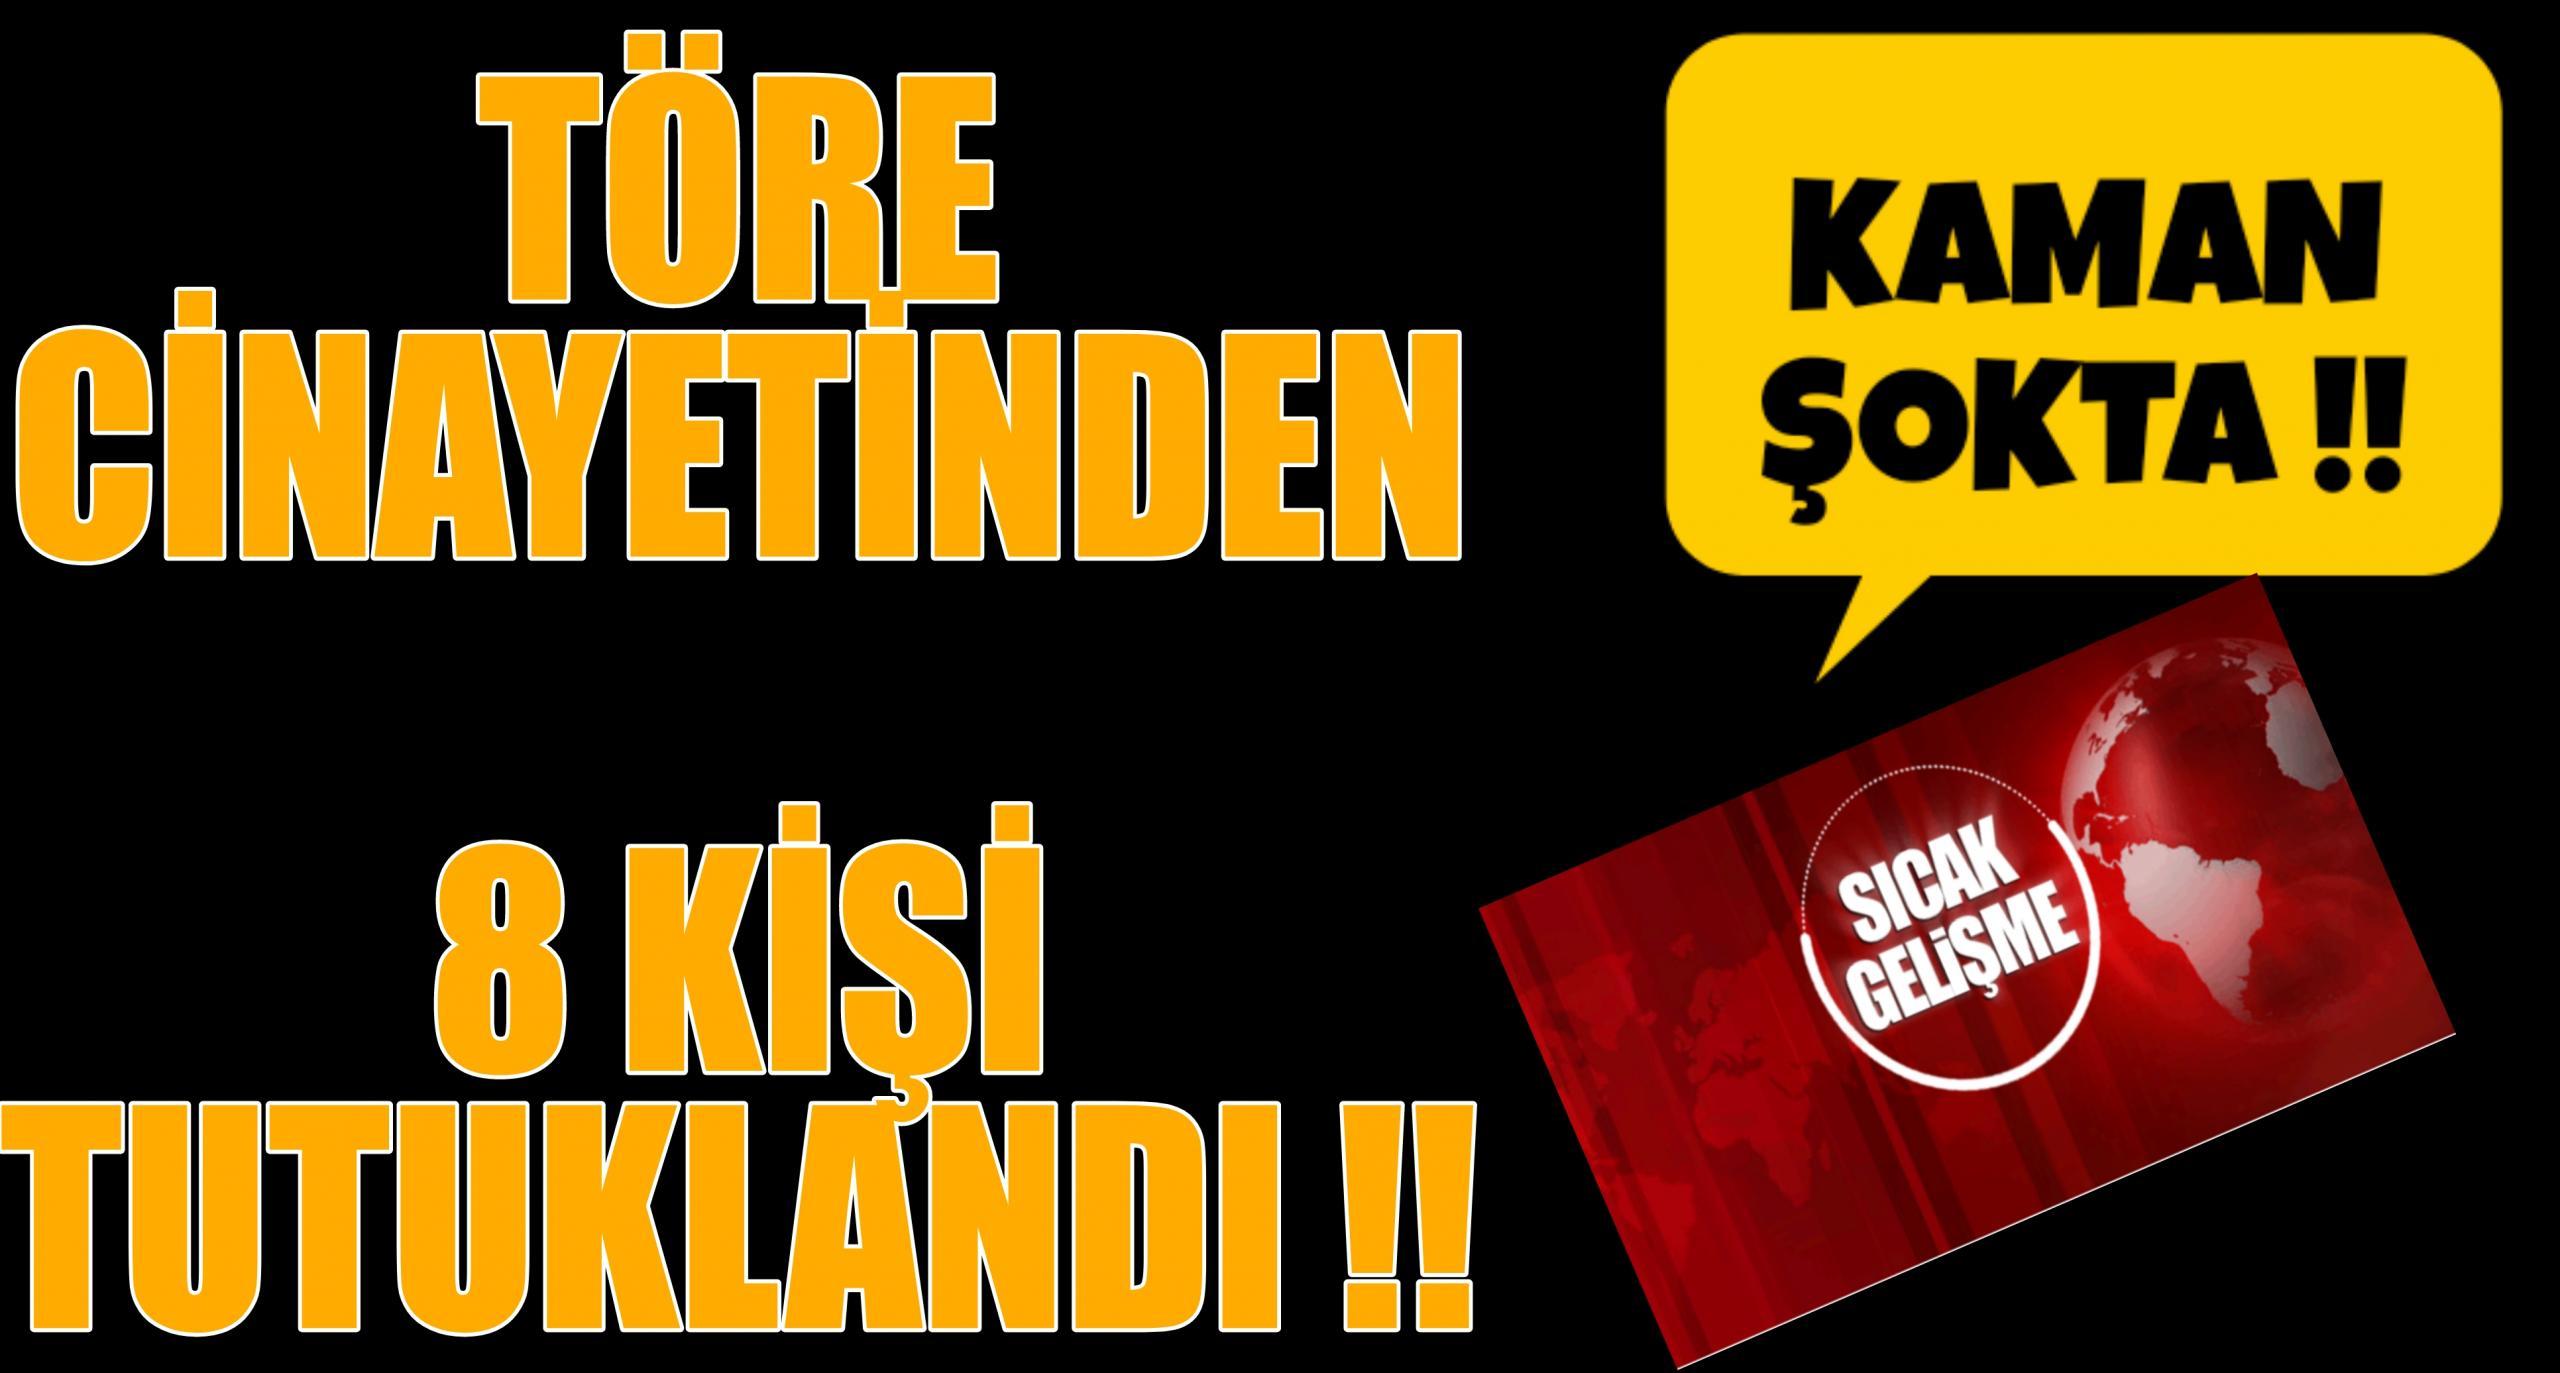 TÖRE CİNAYETİ KAMAN ŞOKTA !!